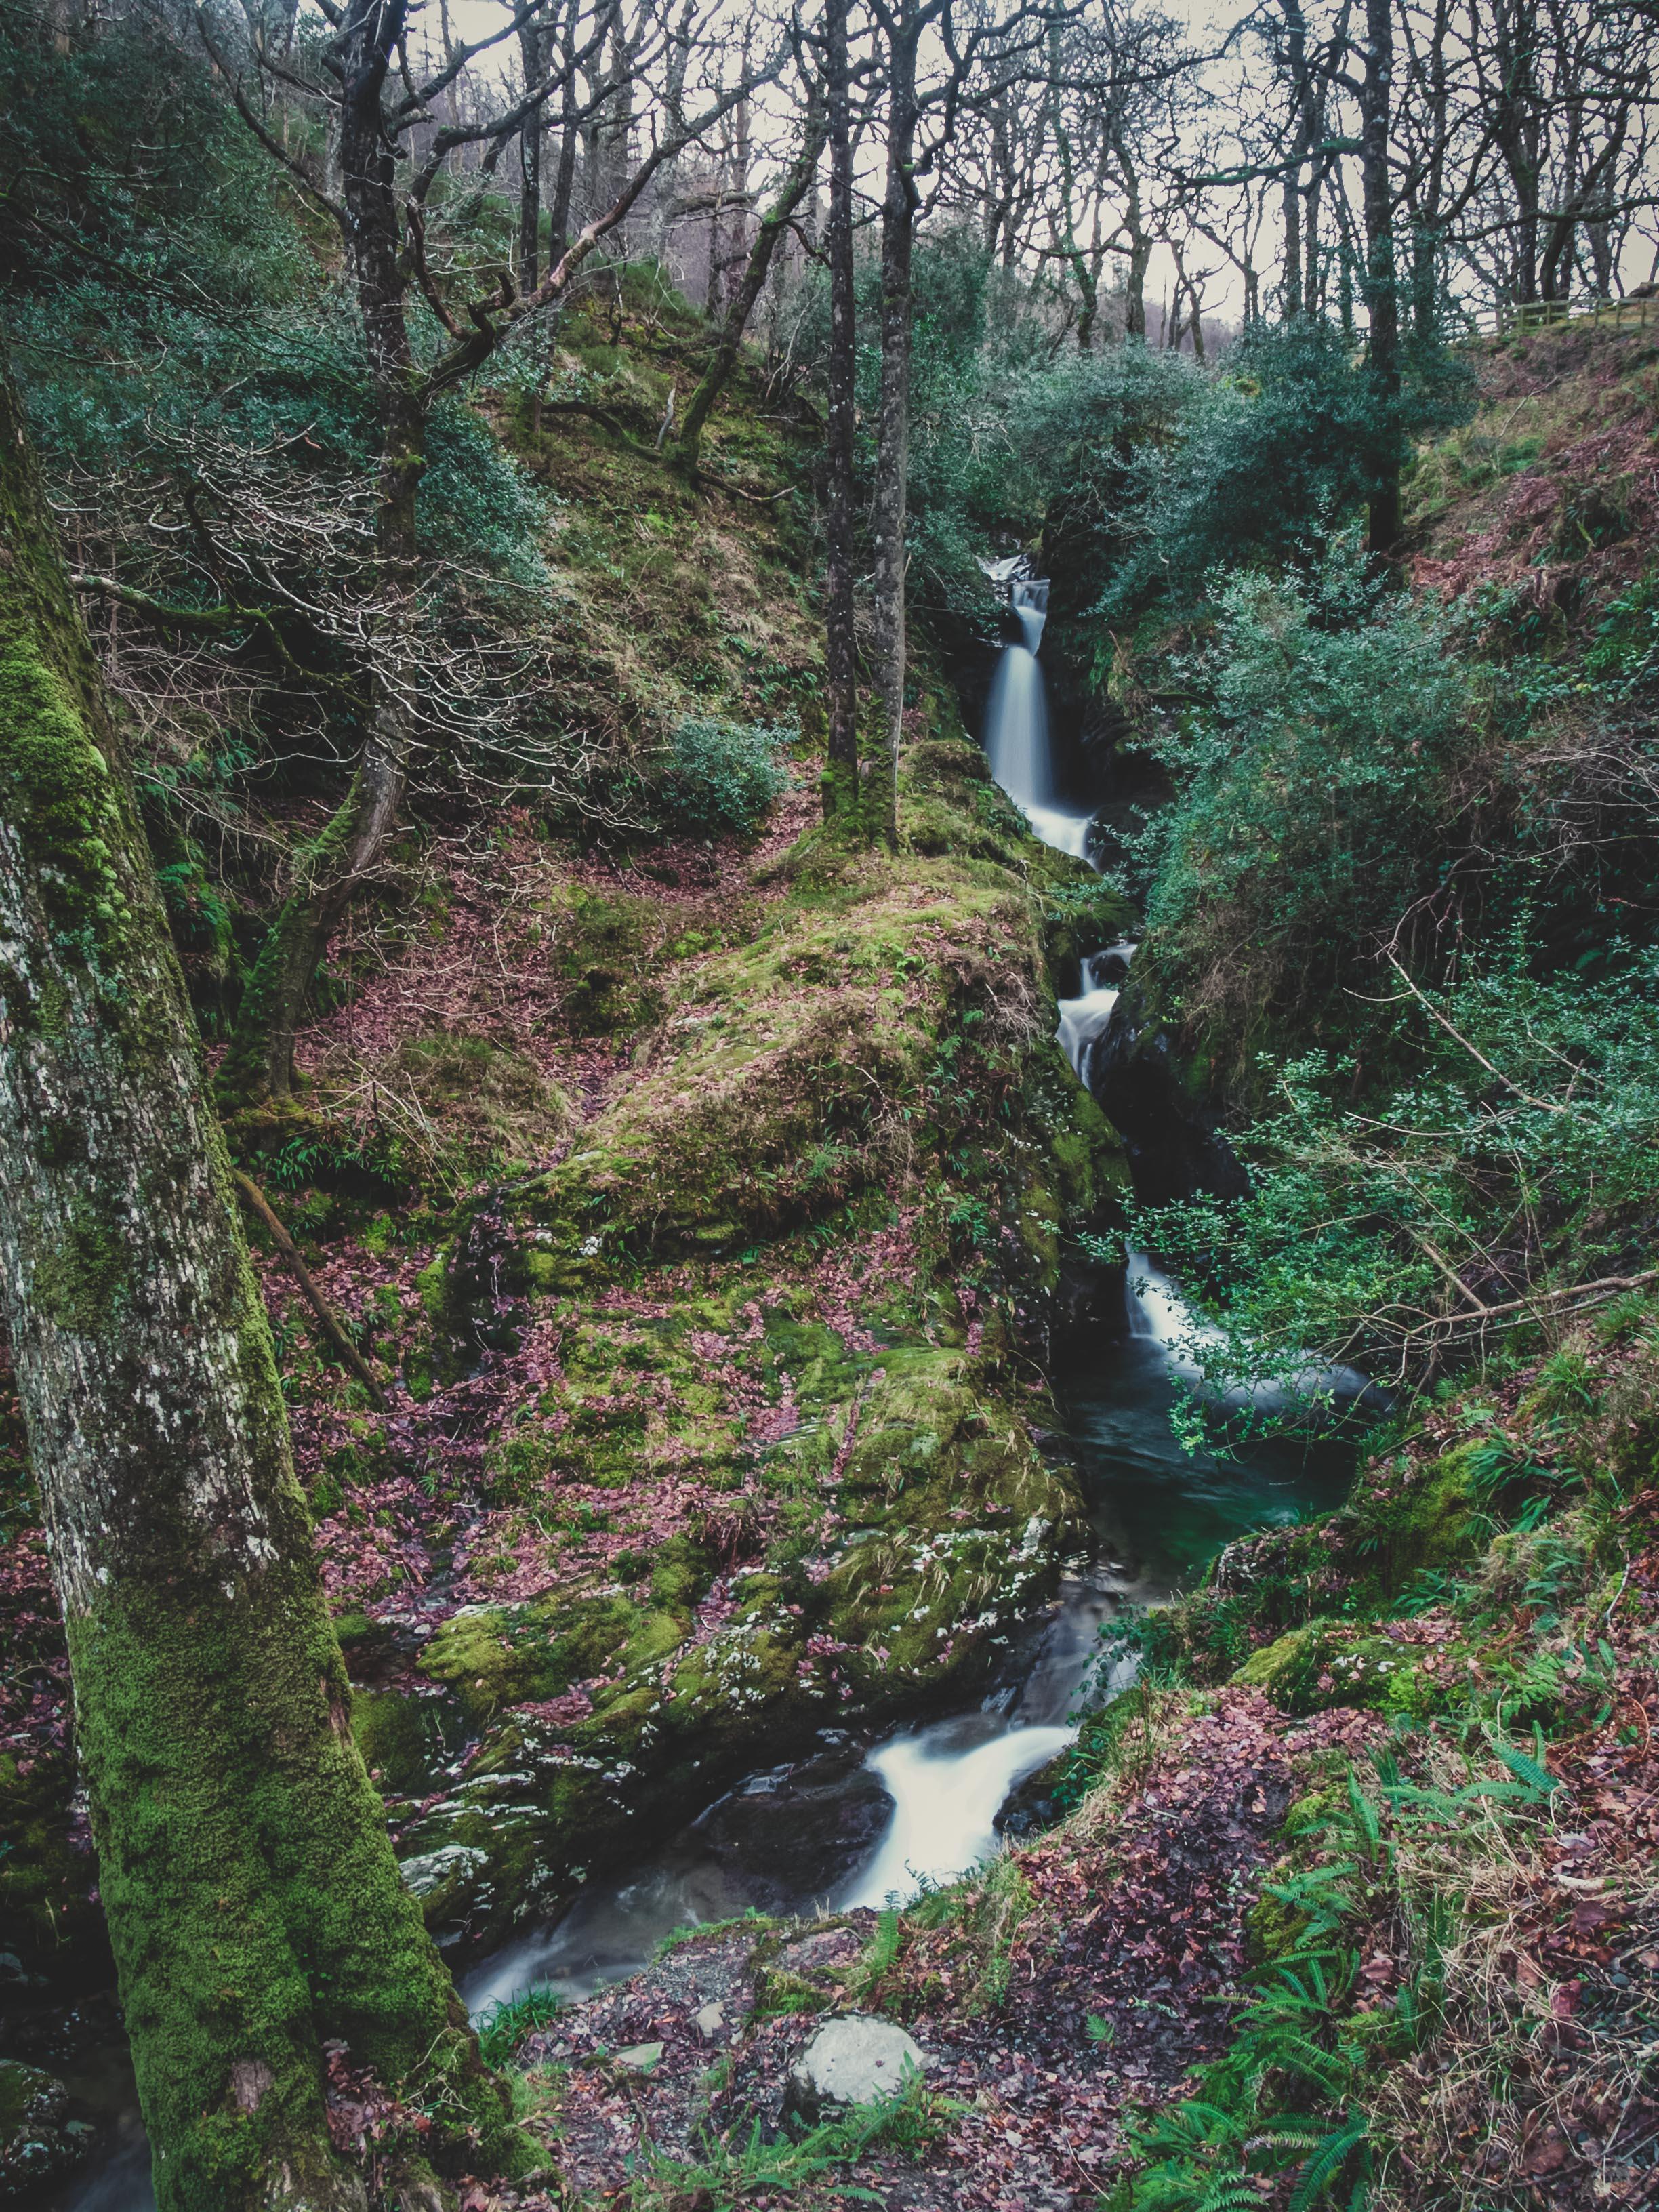 glendalough. irish history. county wicklow. round tower. hill walknig. hiking. grave yard. wildlife. tombstones. lakes. blue sky. tower. waterfall.jpg